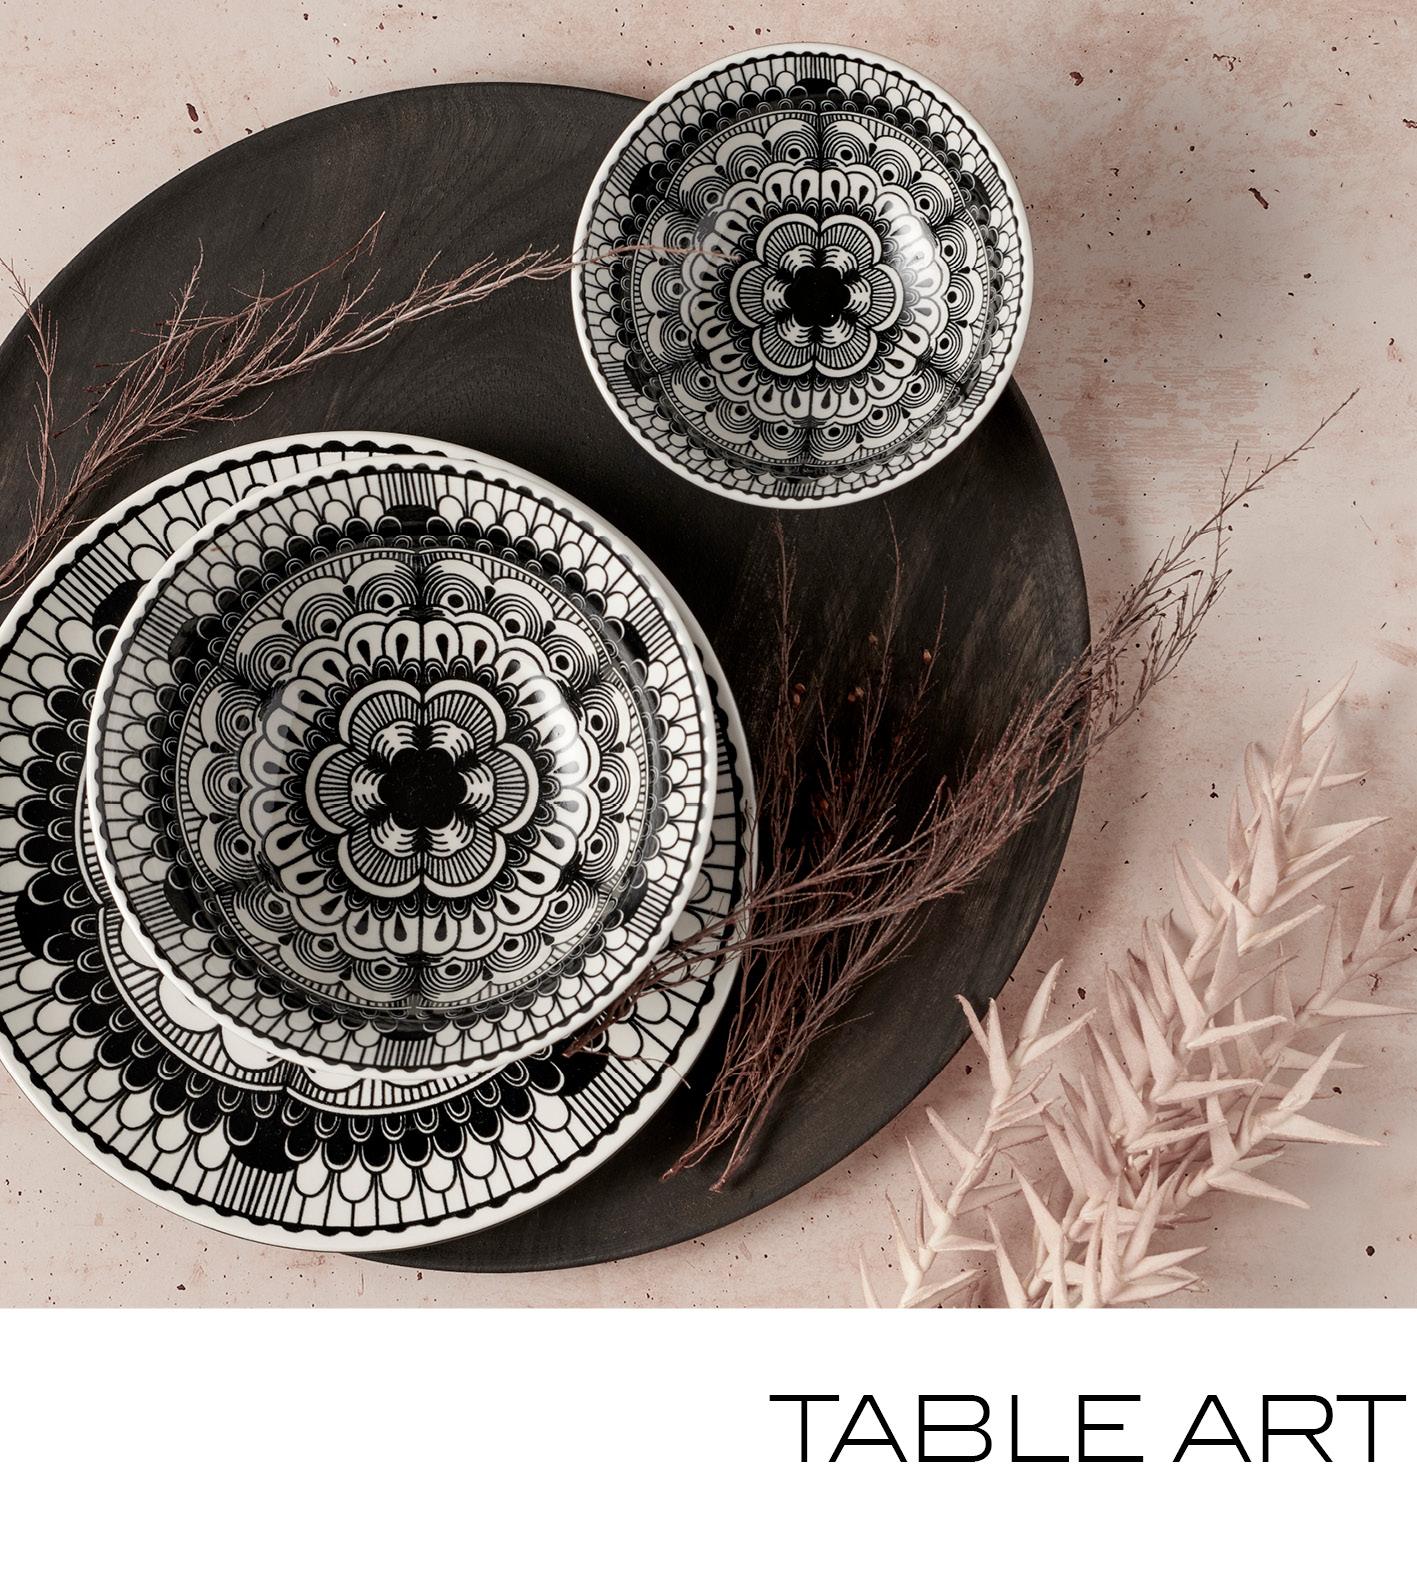 table art